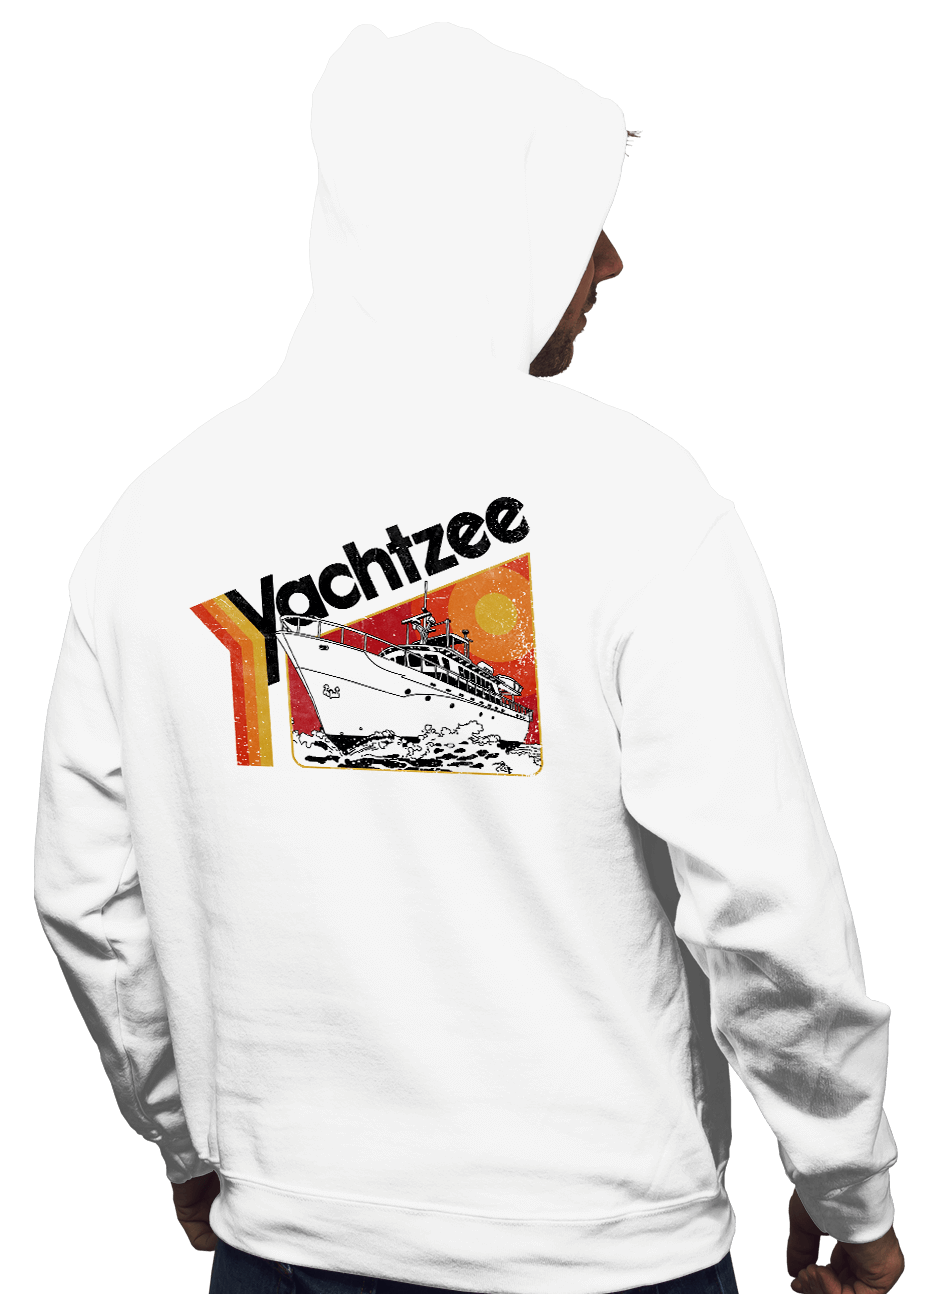 Yachtzee